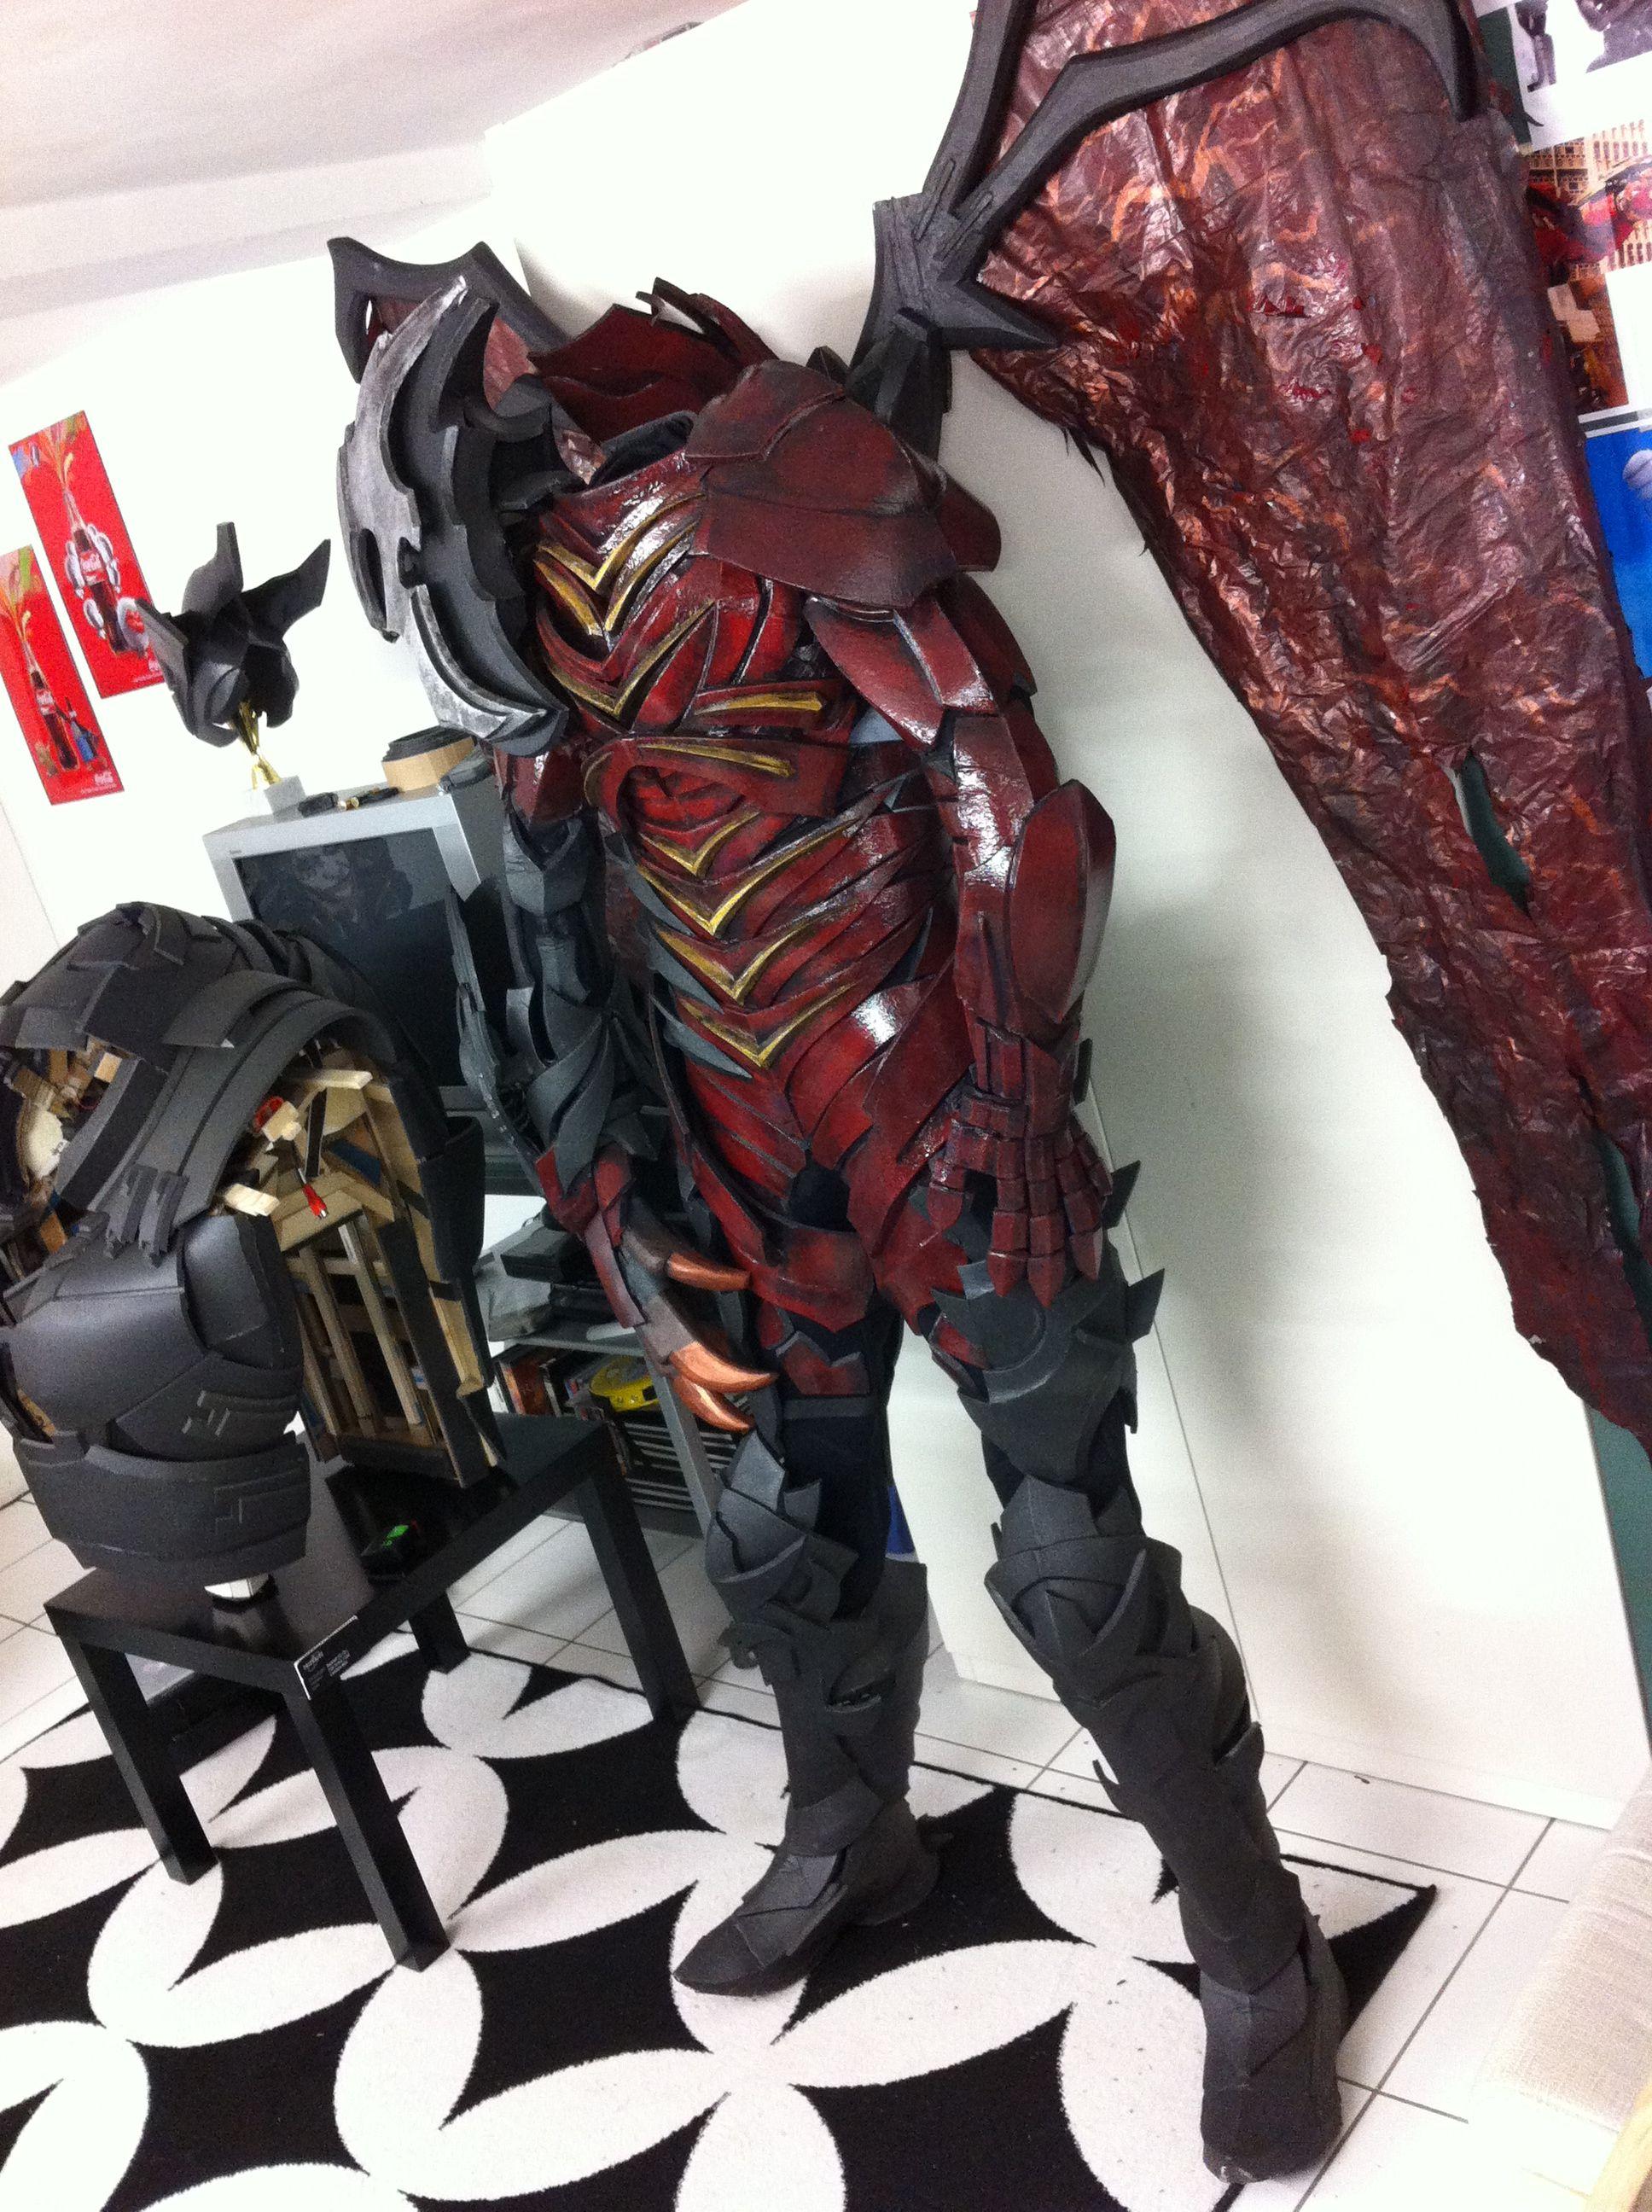 Aatrox League Of Legends Armor Costume By Prizmatec Cosplay Aye